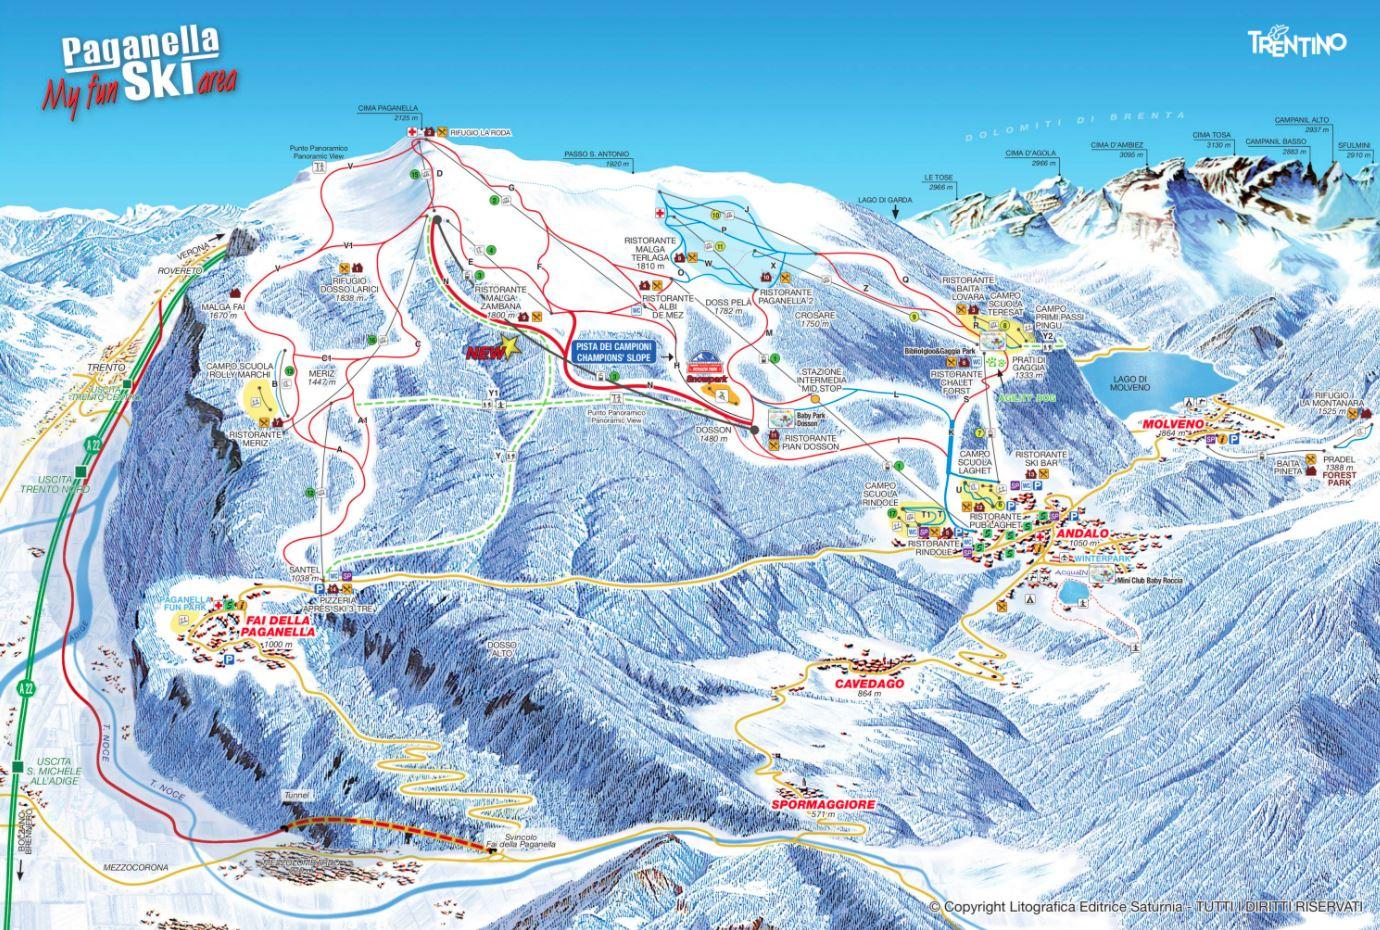 Paganella ski mapa